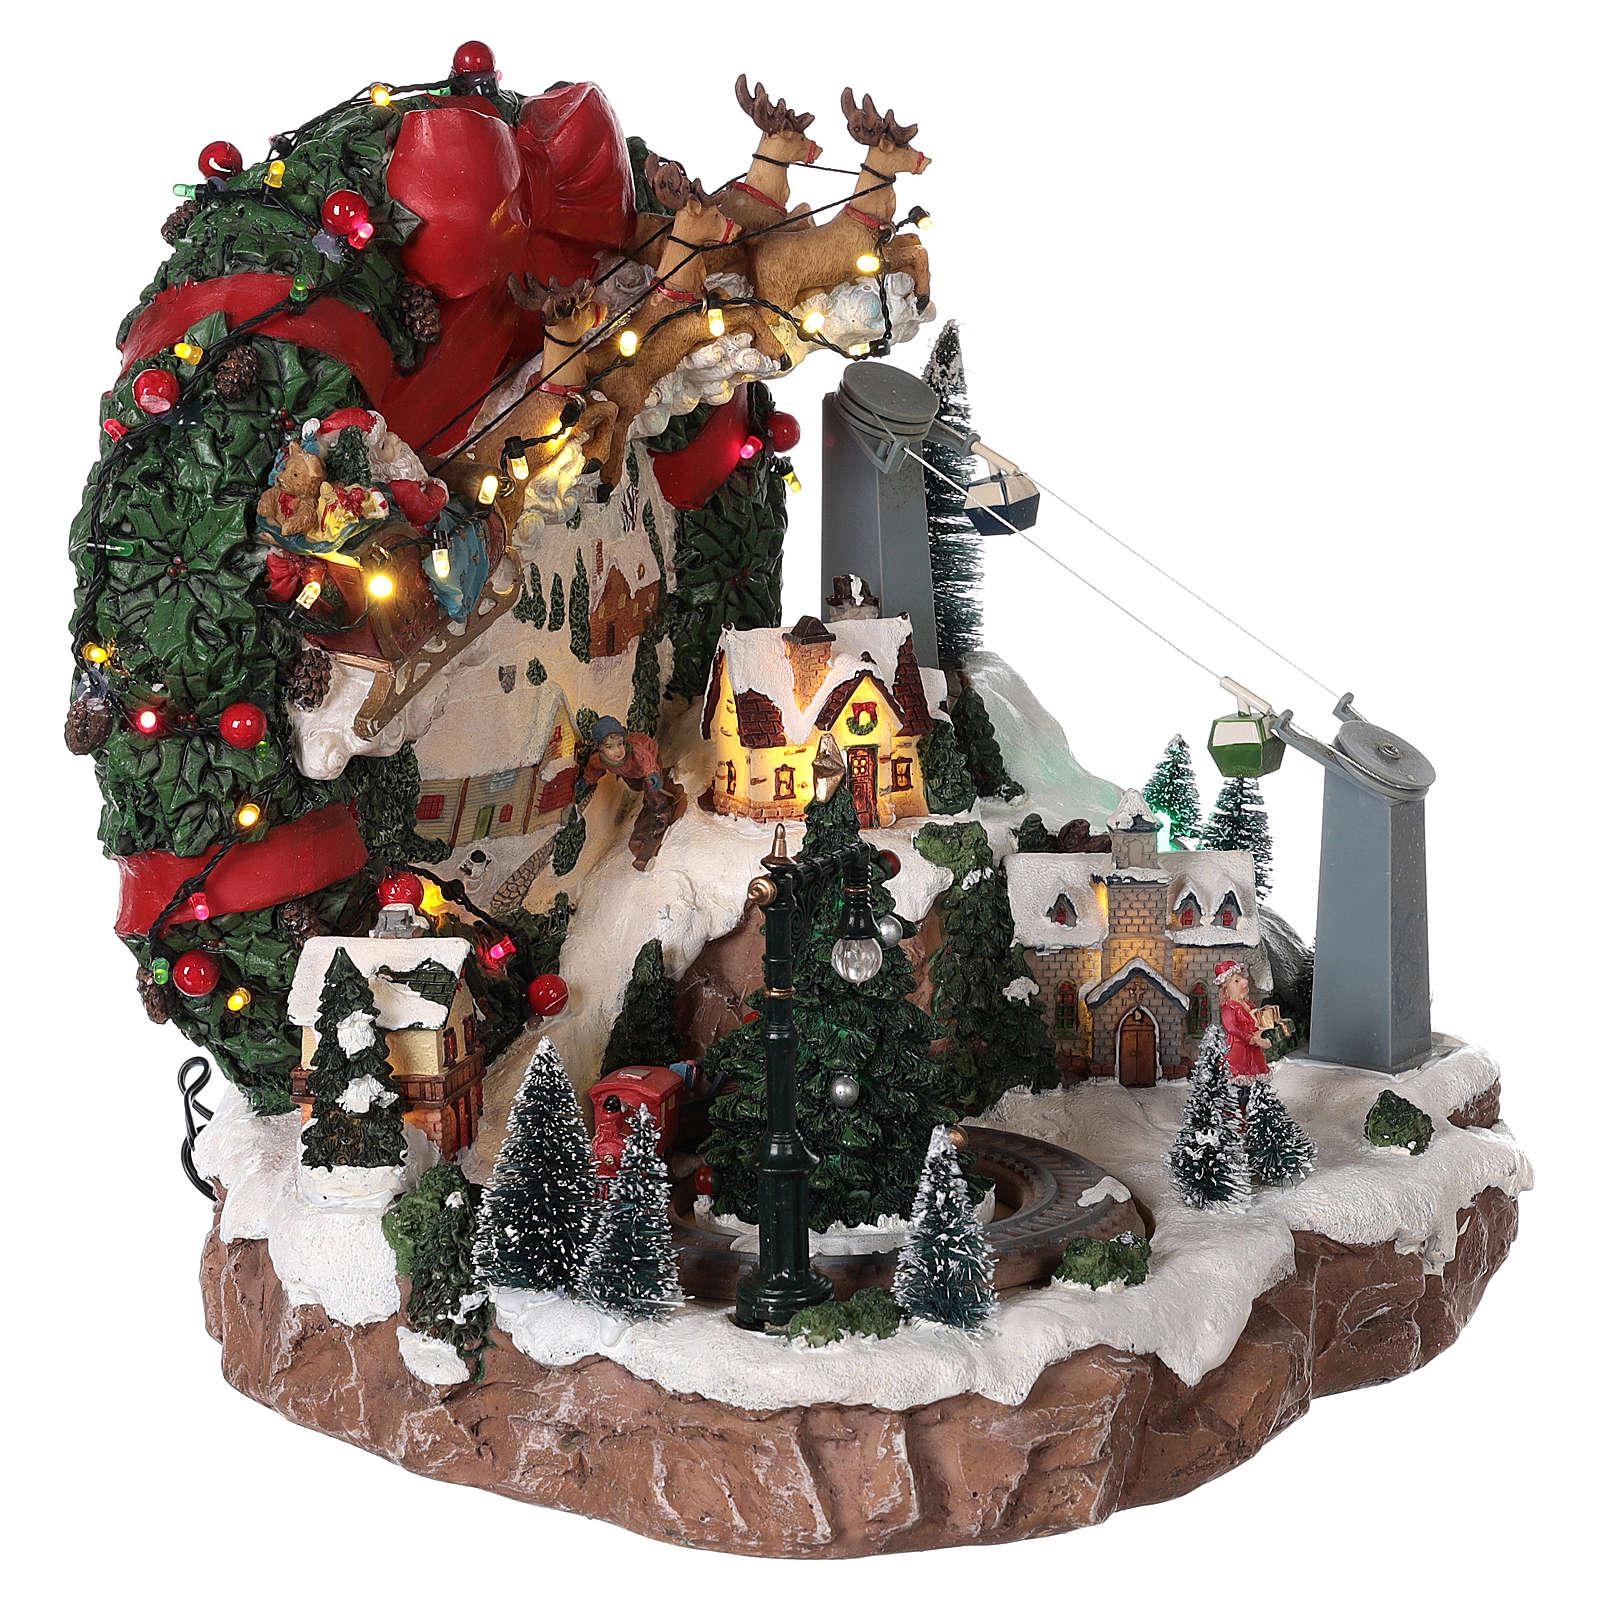 Christmas village reindeer sleigh cableway movement lights music 30x30x30 cm 3